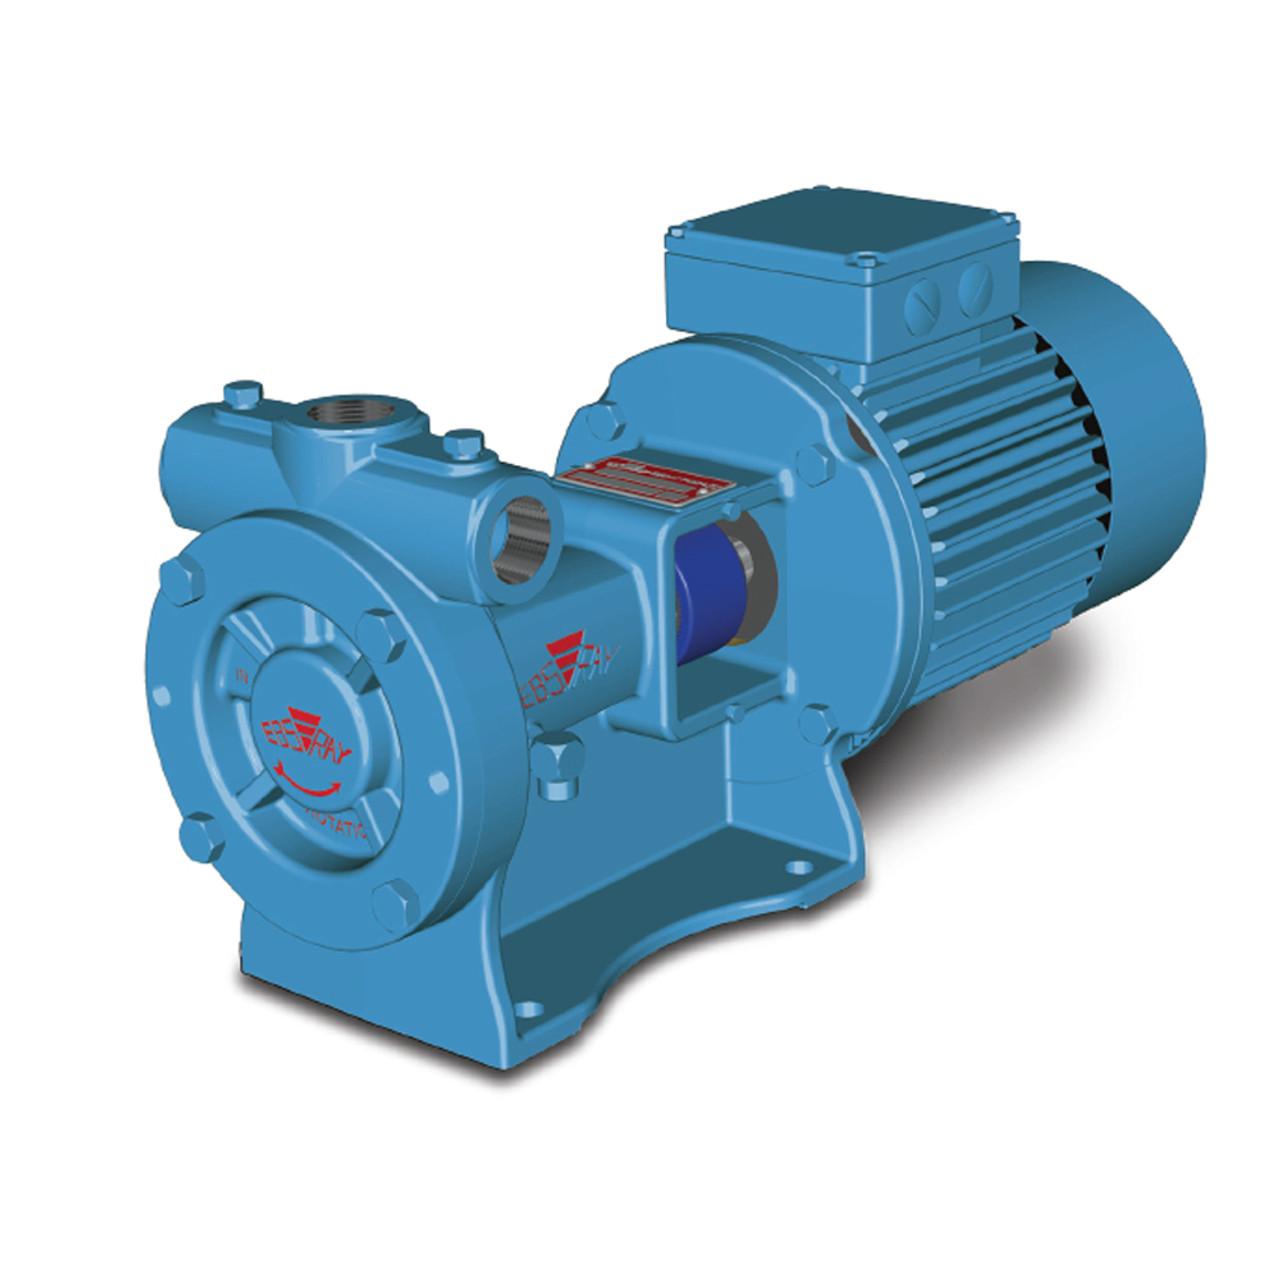 Blackmer Ebsray RC20 and RC25 - Regenerative Turbine Pump for LPG